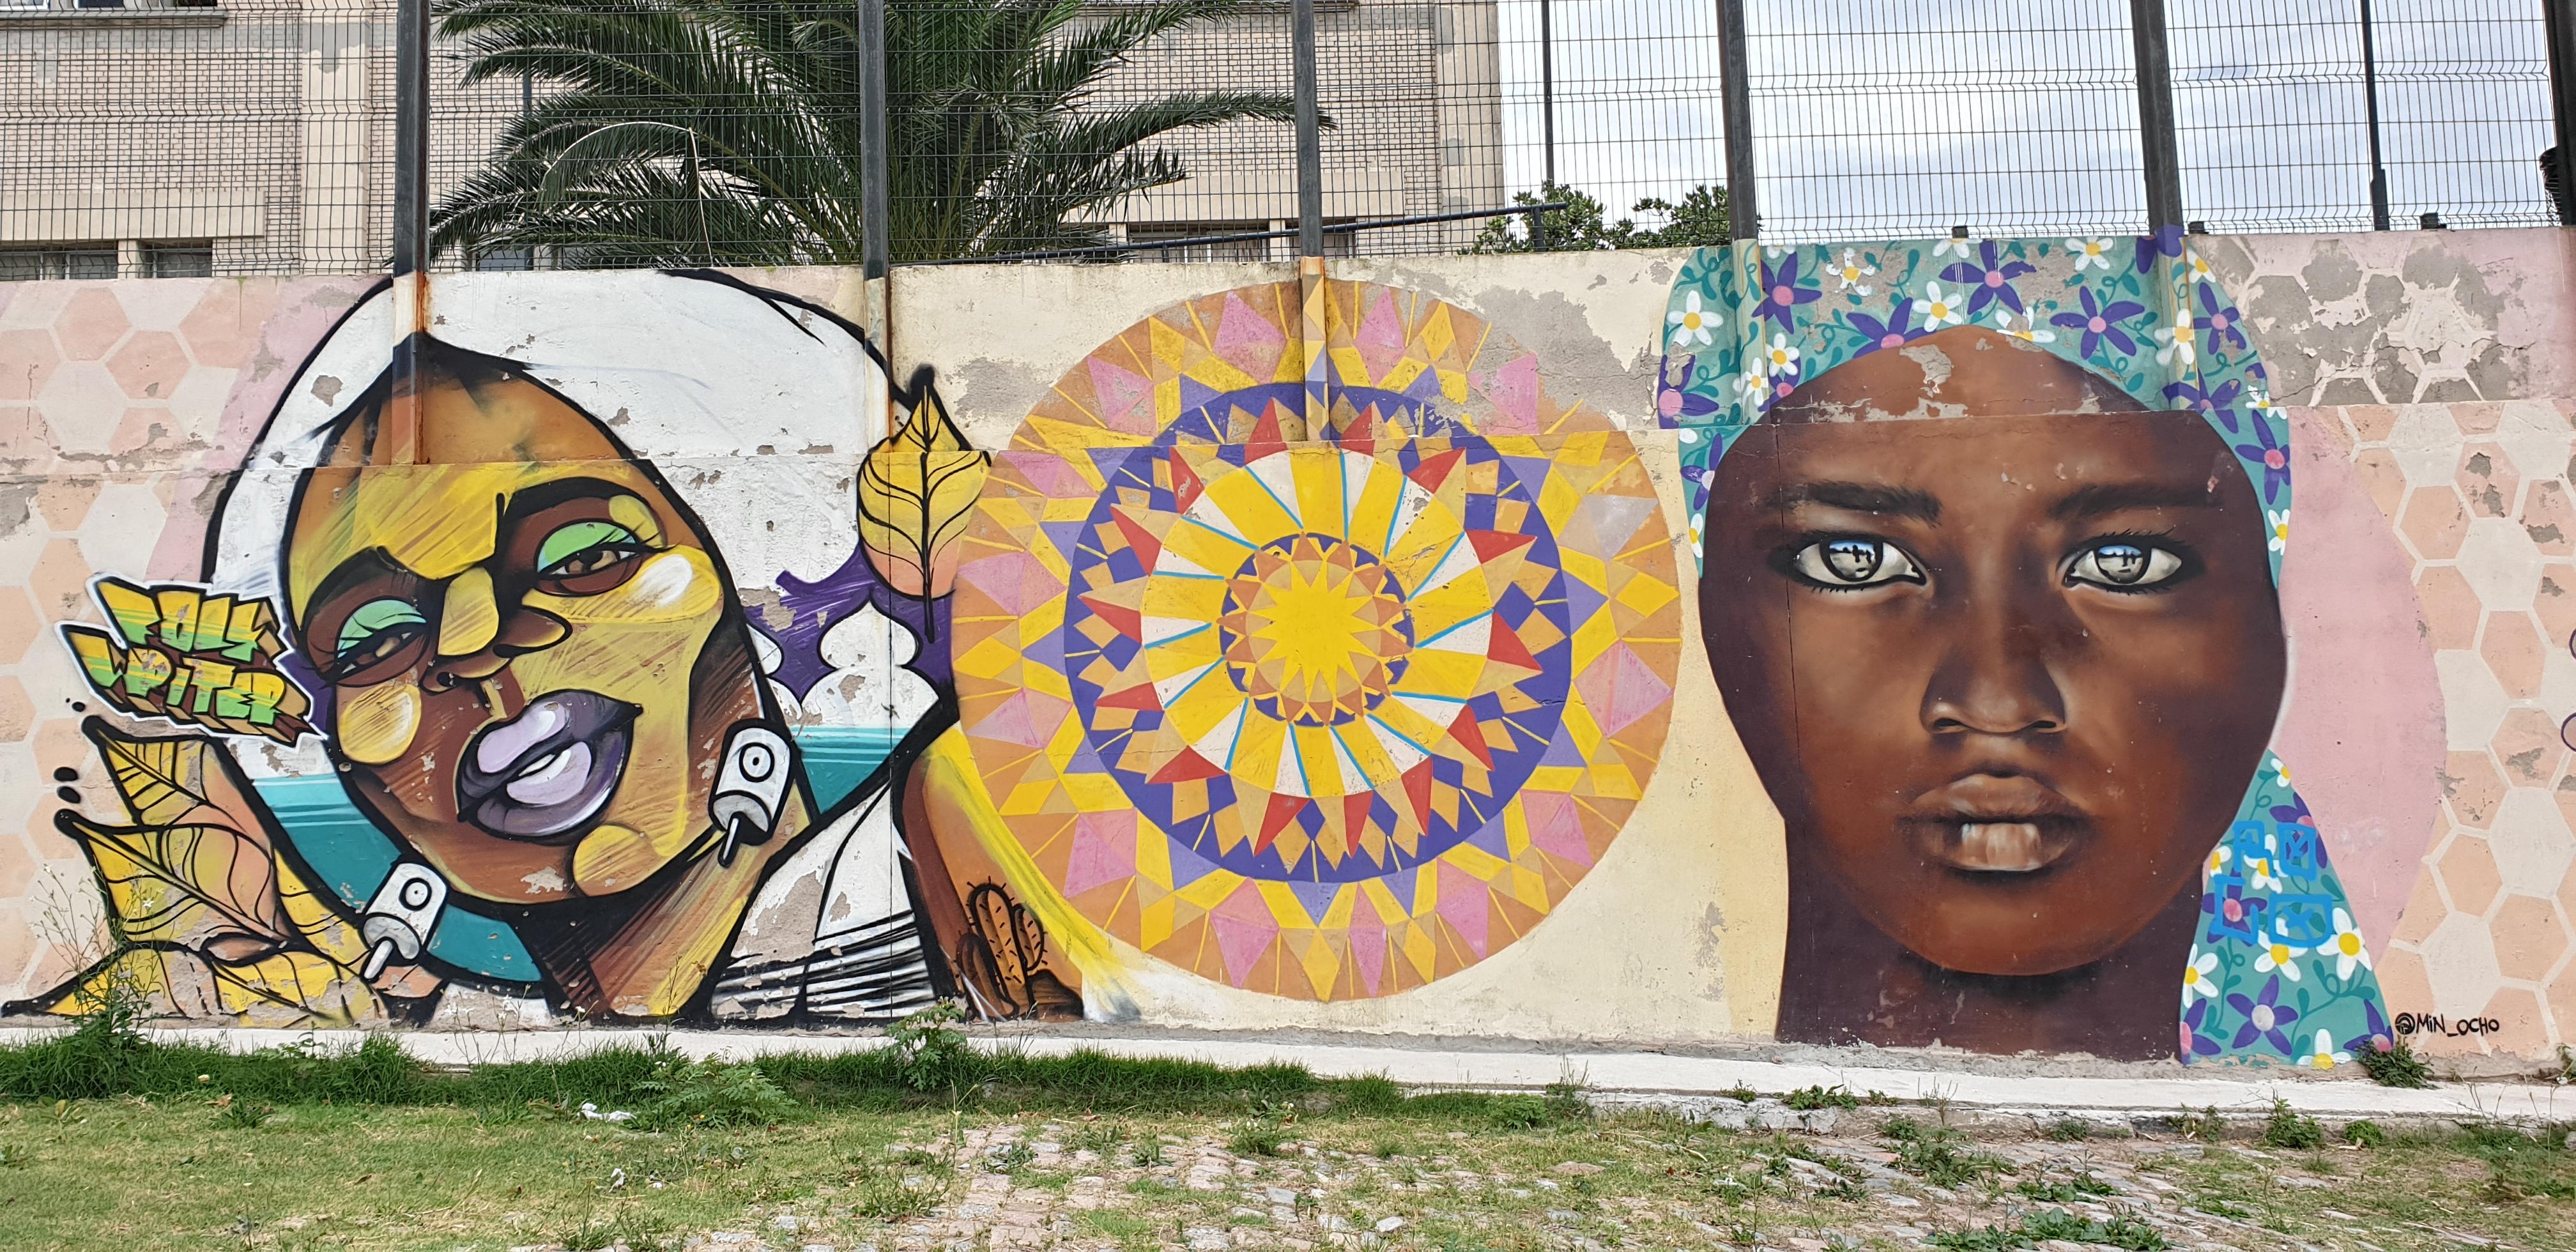 Mur réalisé par FOLK , Wendchinita, MIN8 - Montevideo - Uruguay 2020 - ©nofakeinmynews.com